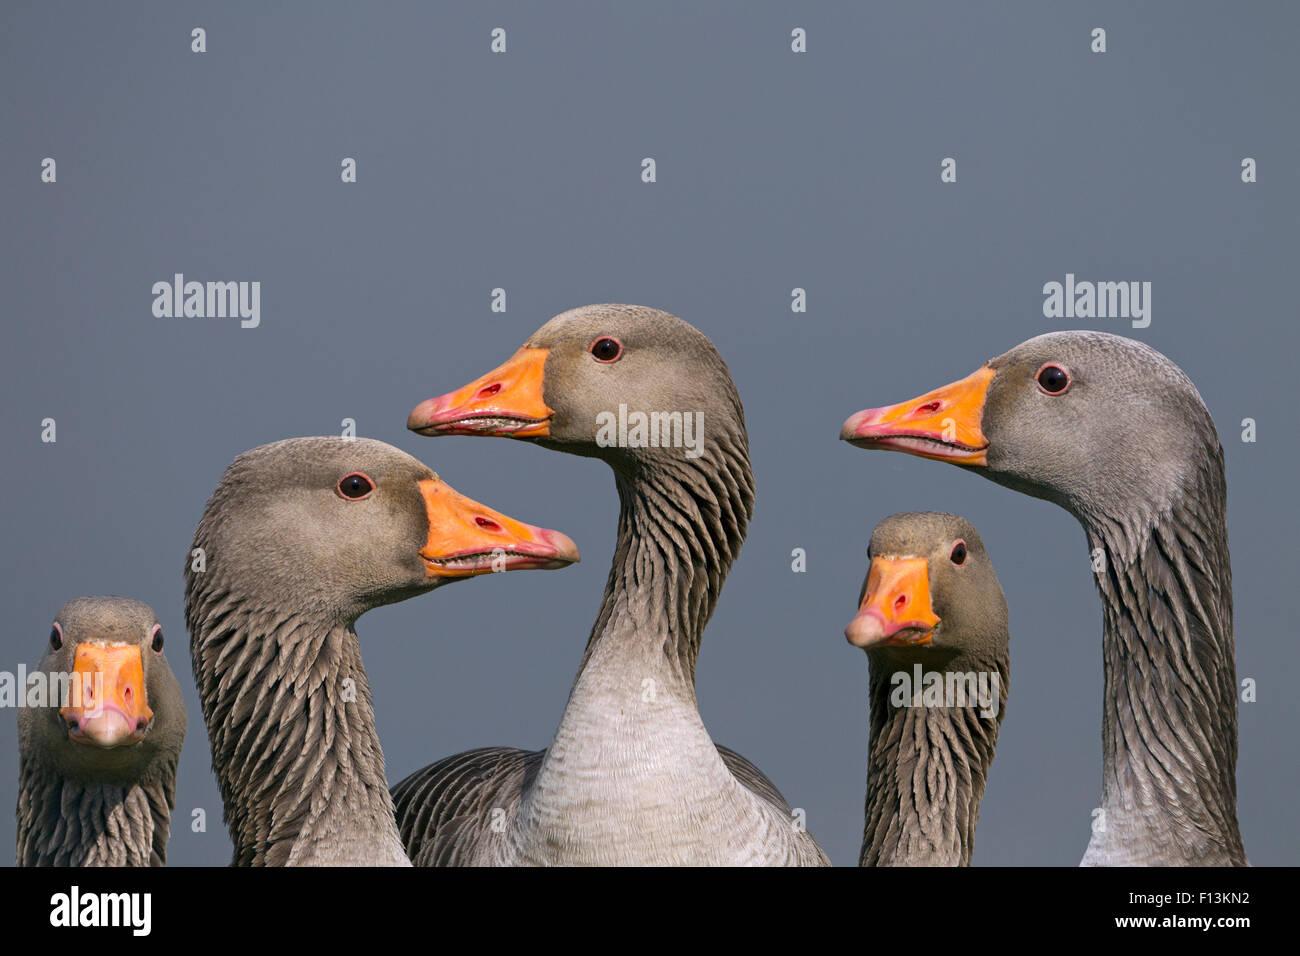 Greylag geese (Anser anser). Cley, Norfolk, UK, March. Digital composite. - Stock Image